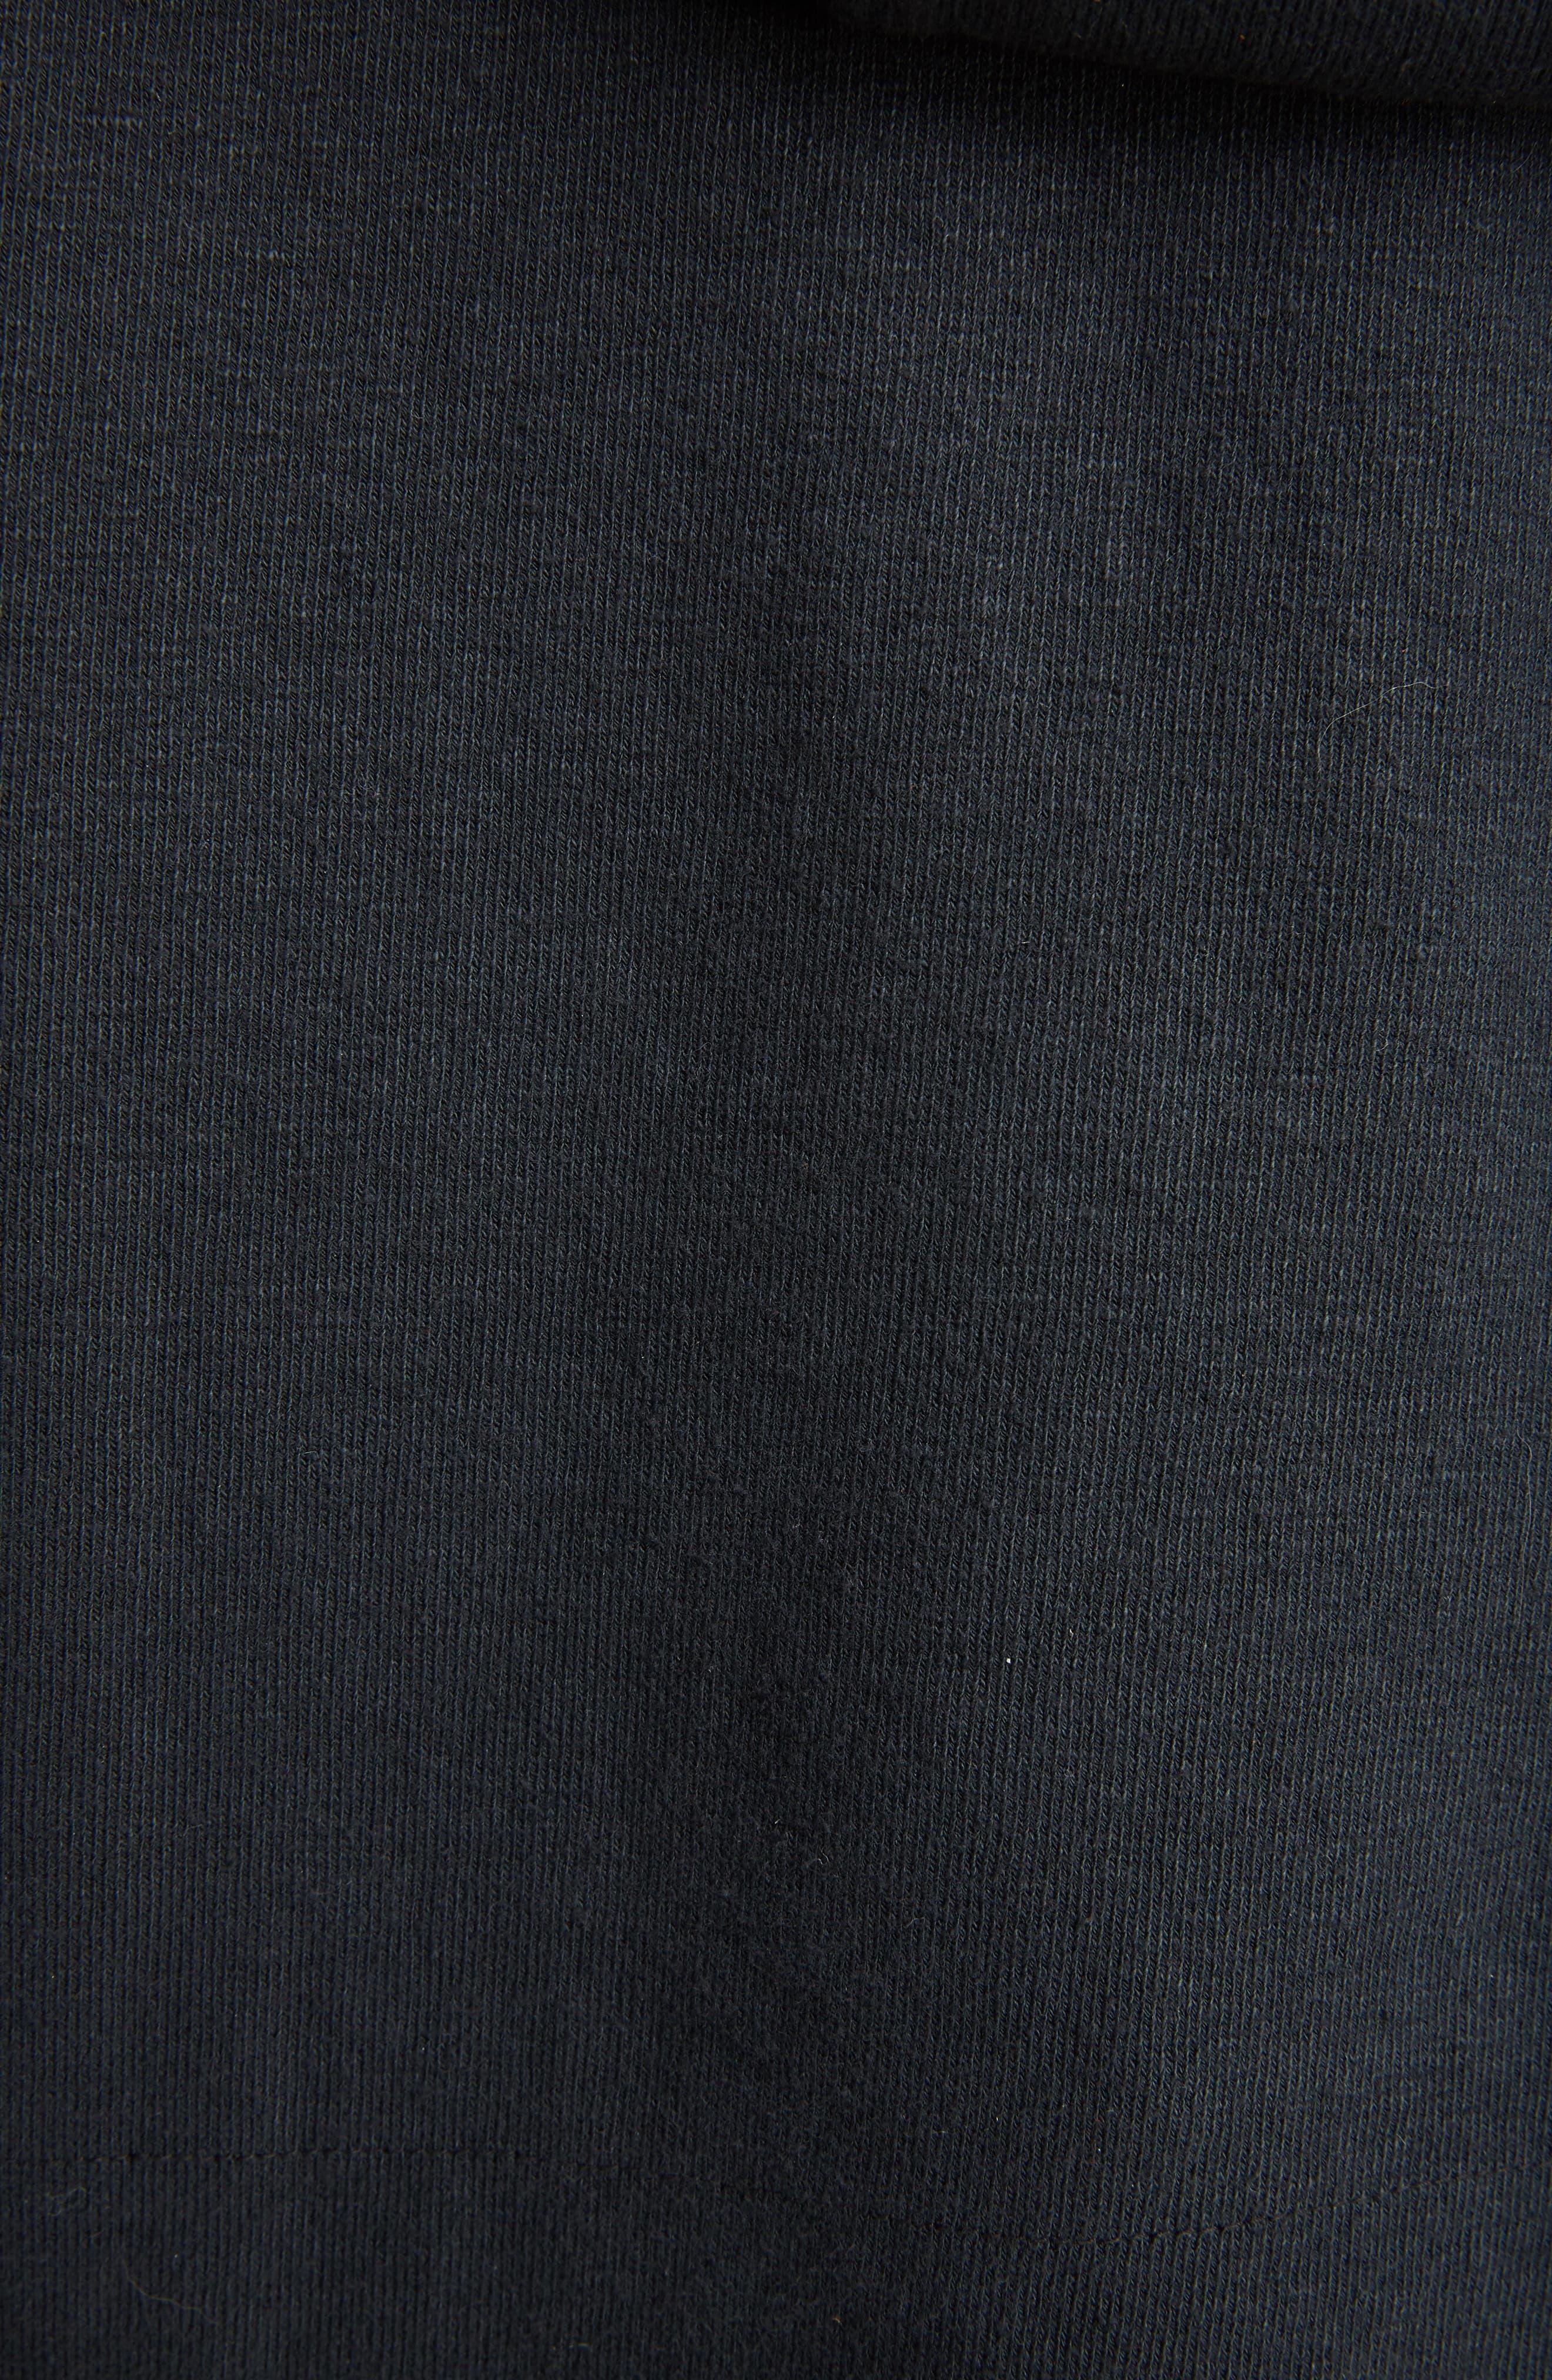 J.W.ANDERSON Oversized Crop Hoodie,                             Alternate thumbnail 5, color,                             Black